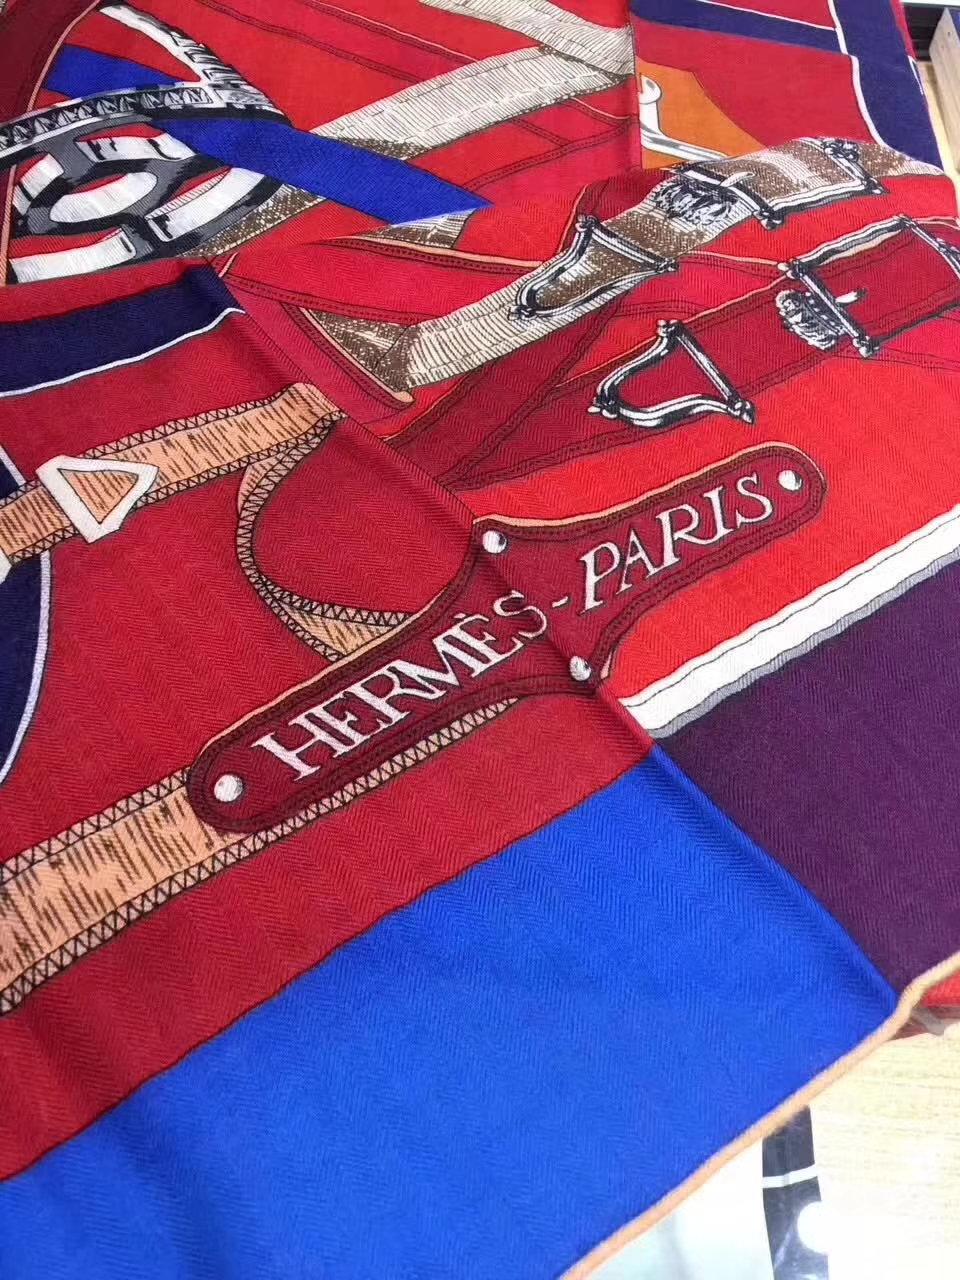 On Sale Hermes Scarf Grade-A Cashmere Women's Cape140*140cm